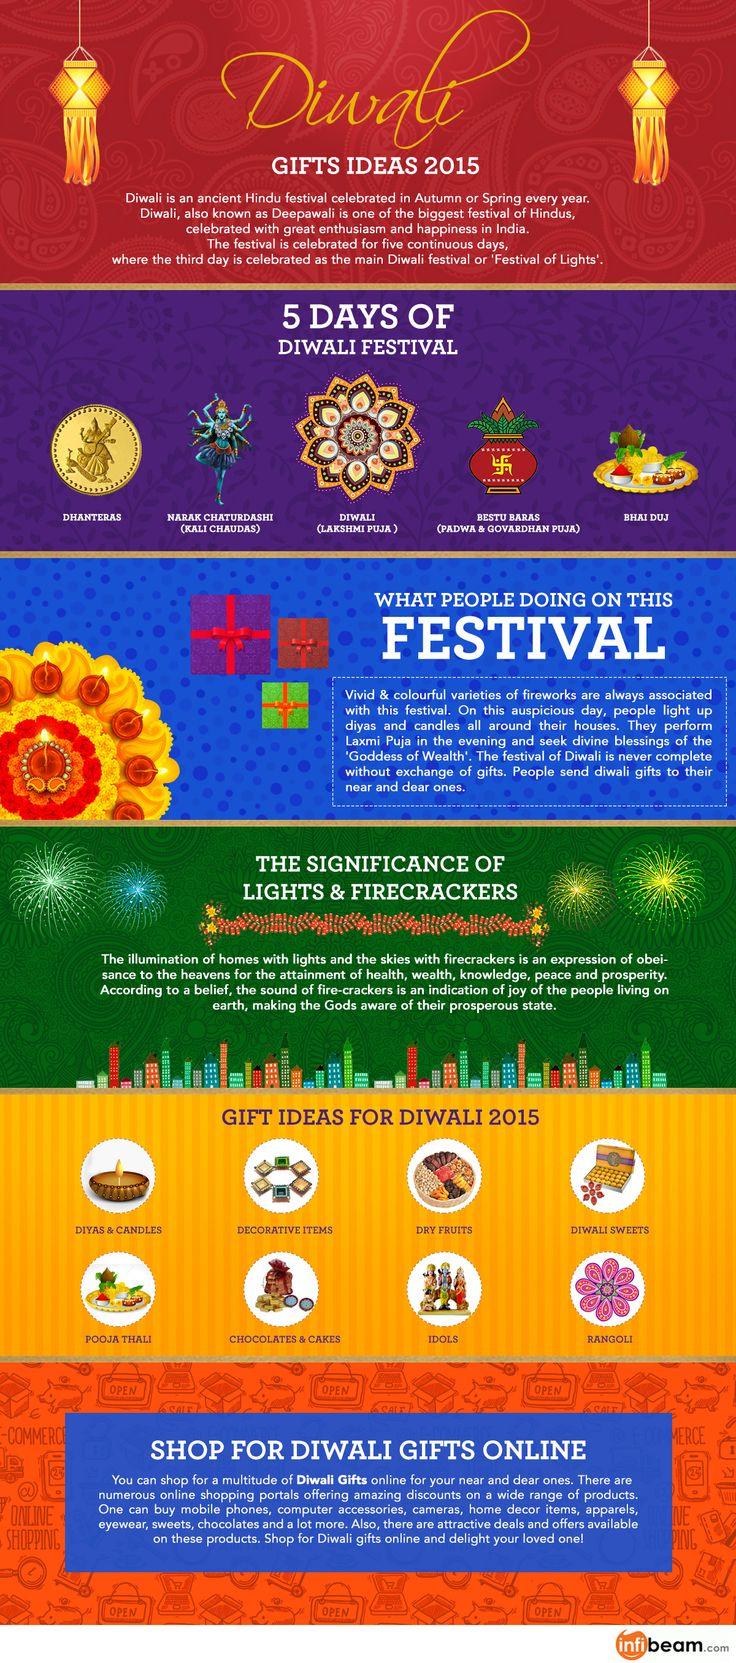 Diwali Gifts Ideas 2015